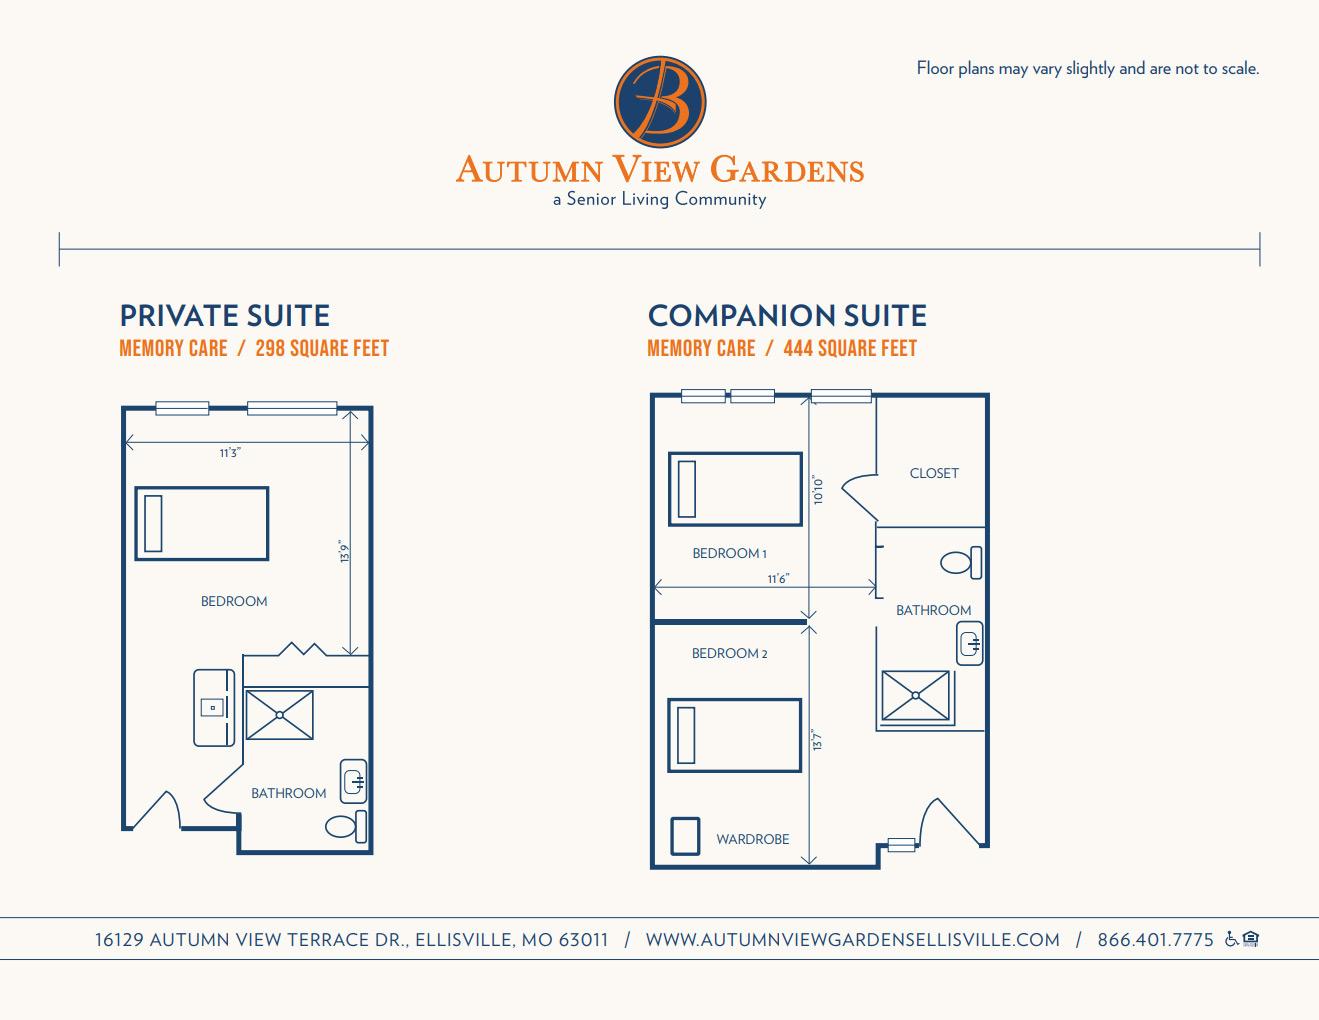 autumn view gardens memory care floor plans